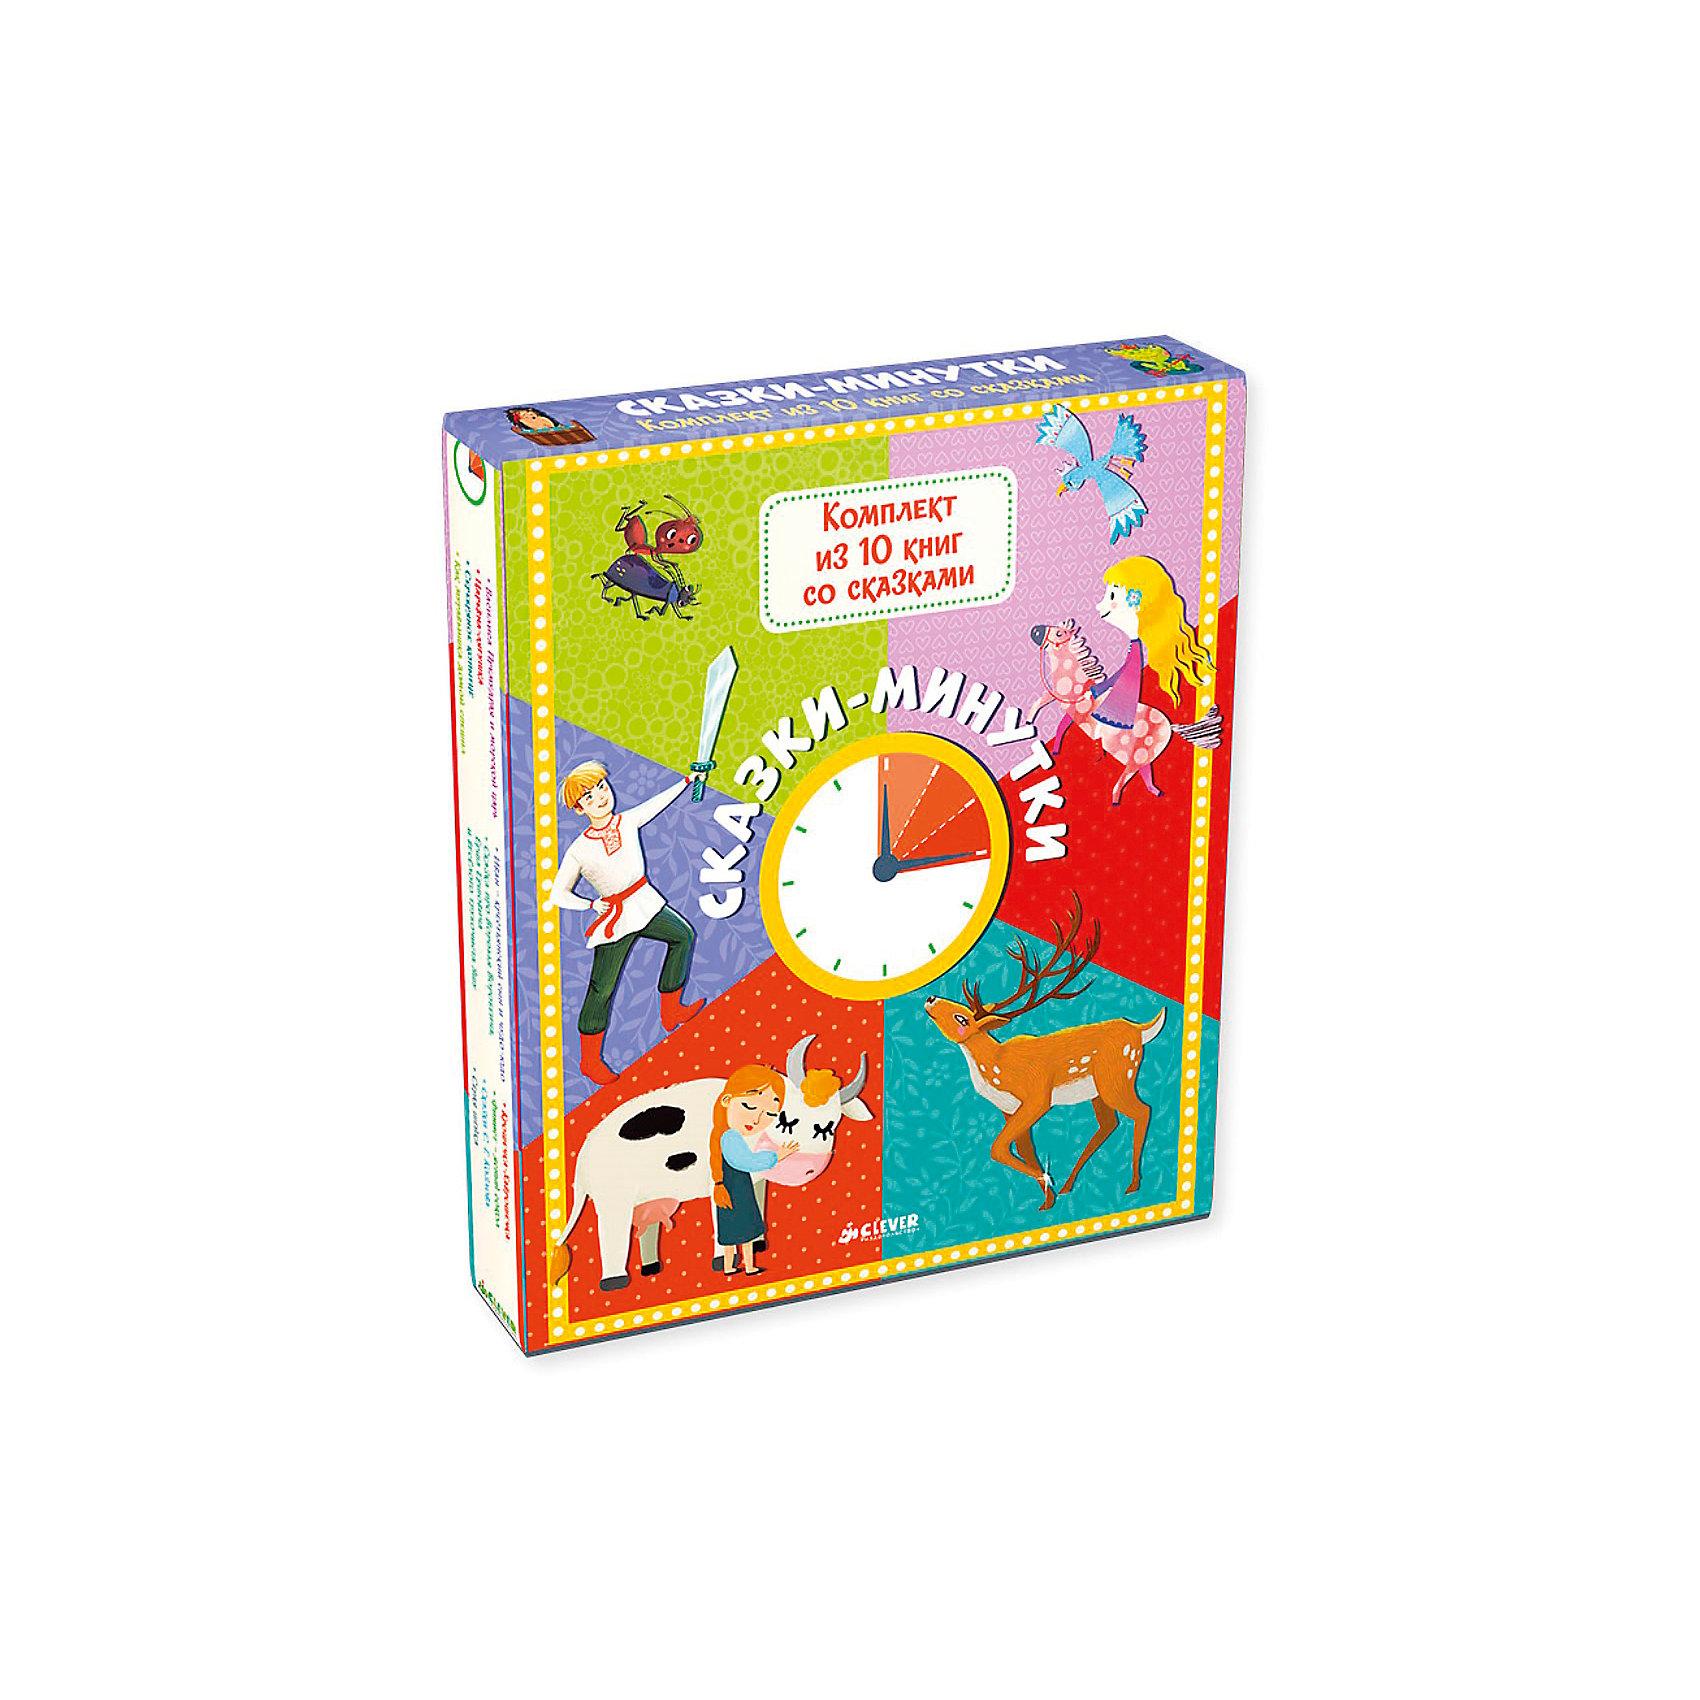 Clever Комплект Сказки-минутки (10 книг) сказки минутки сказка про воробья воробеича ерша ершовича и весёлого трубочиста яшу мамин сибиряк